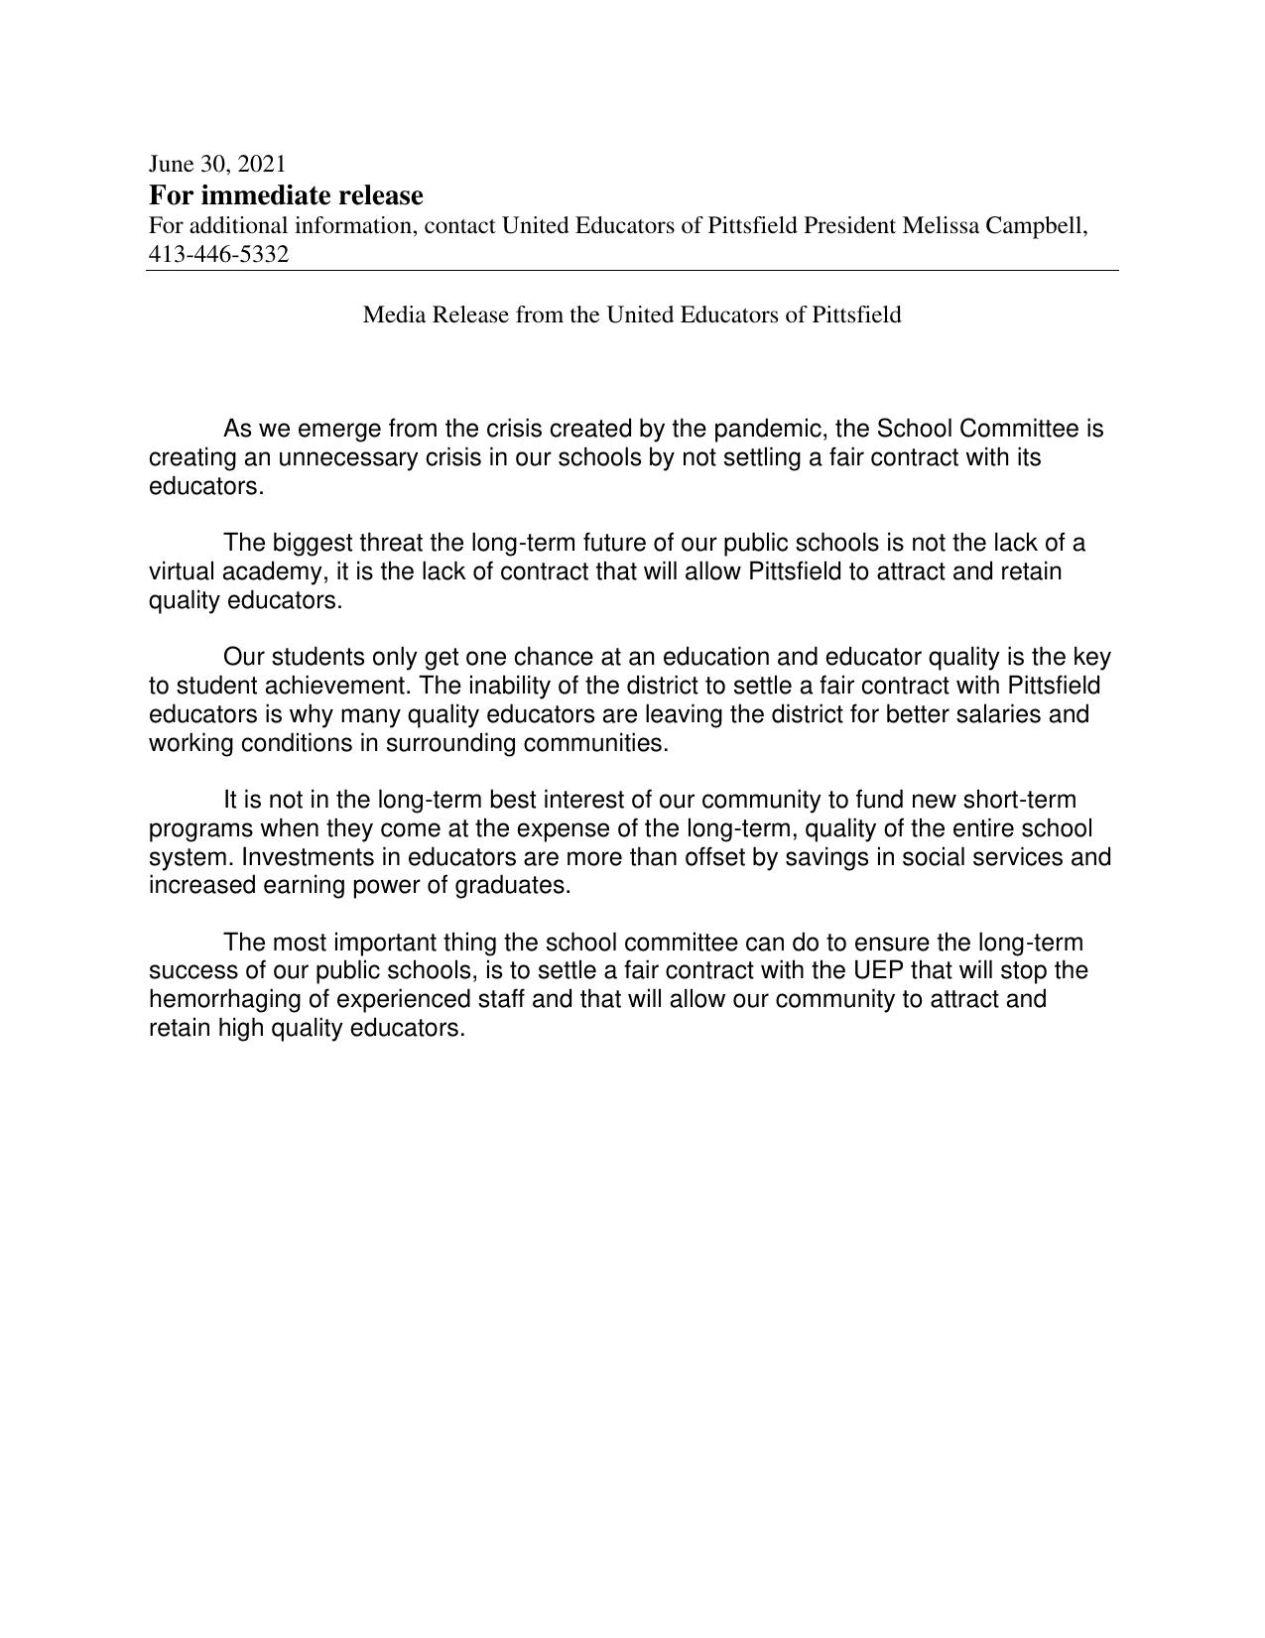 UEP statement